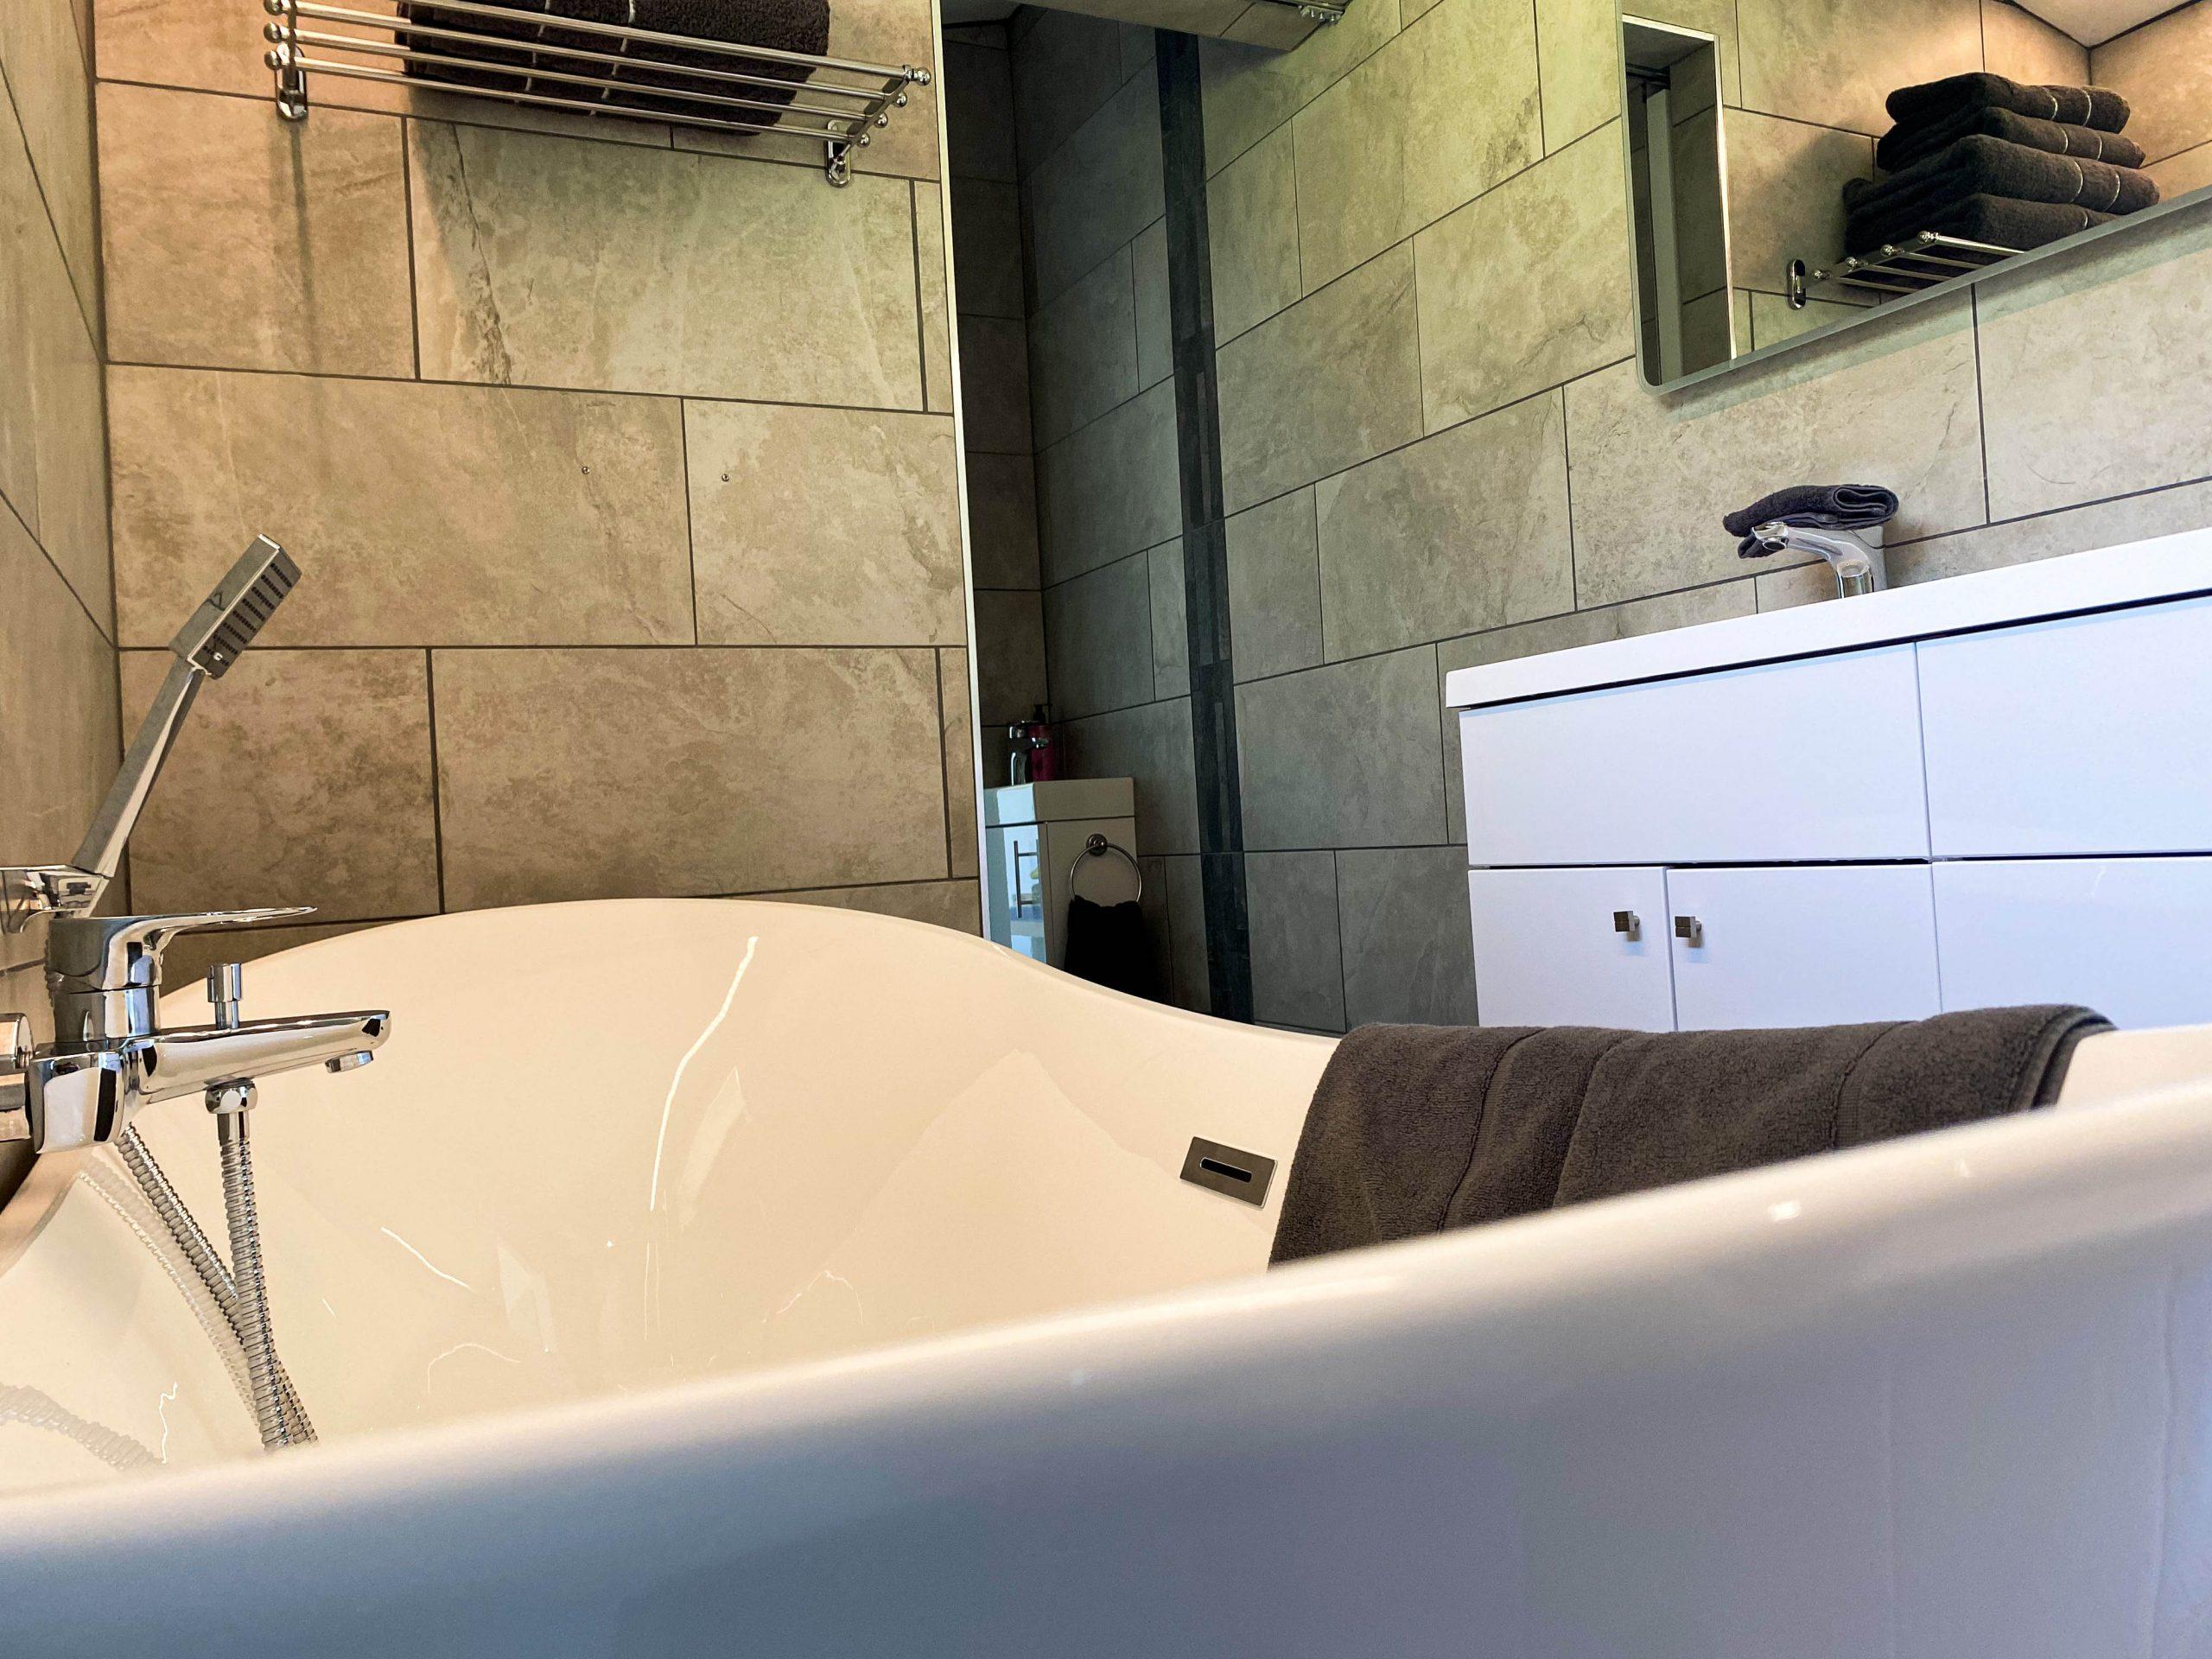 The luxurious freestanding bath